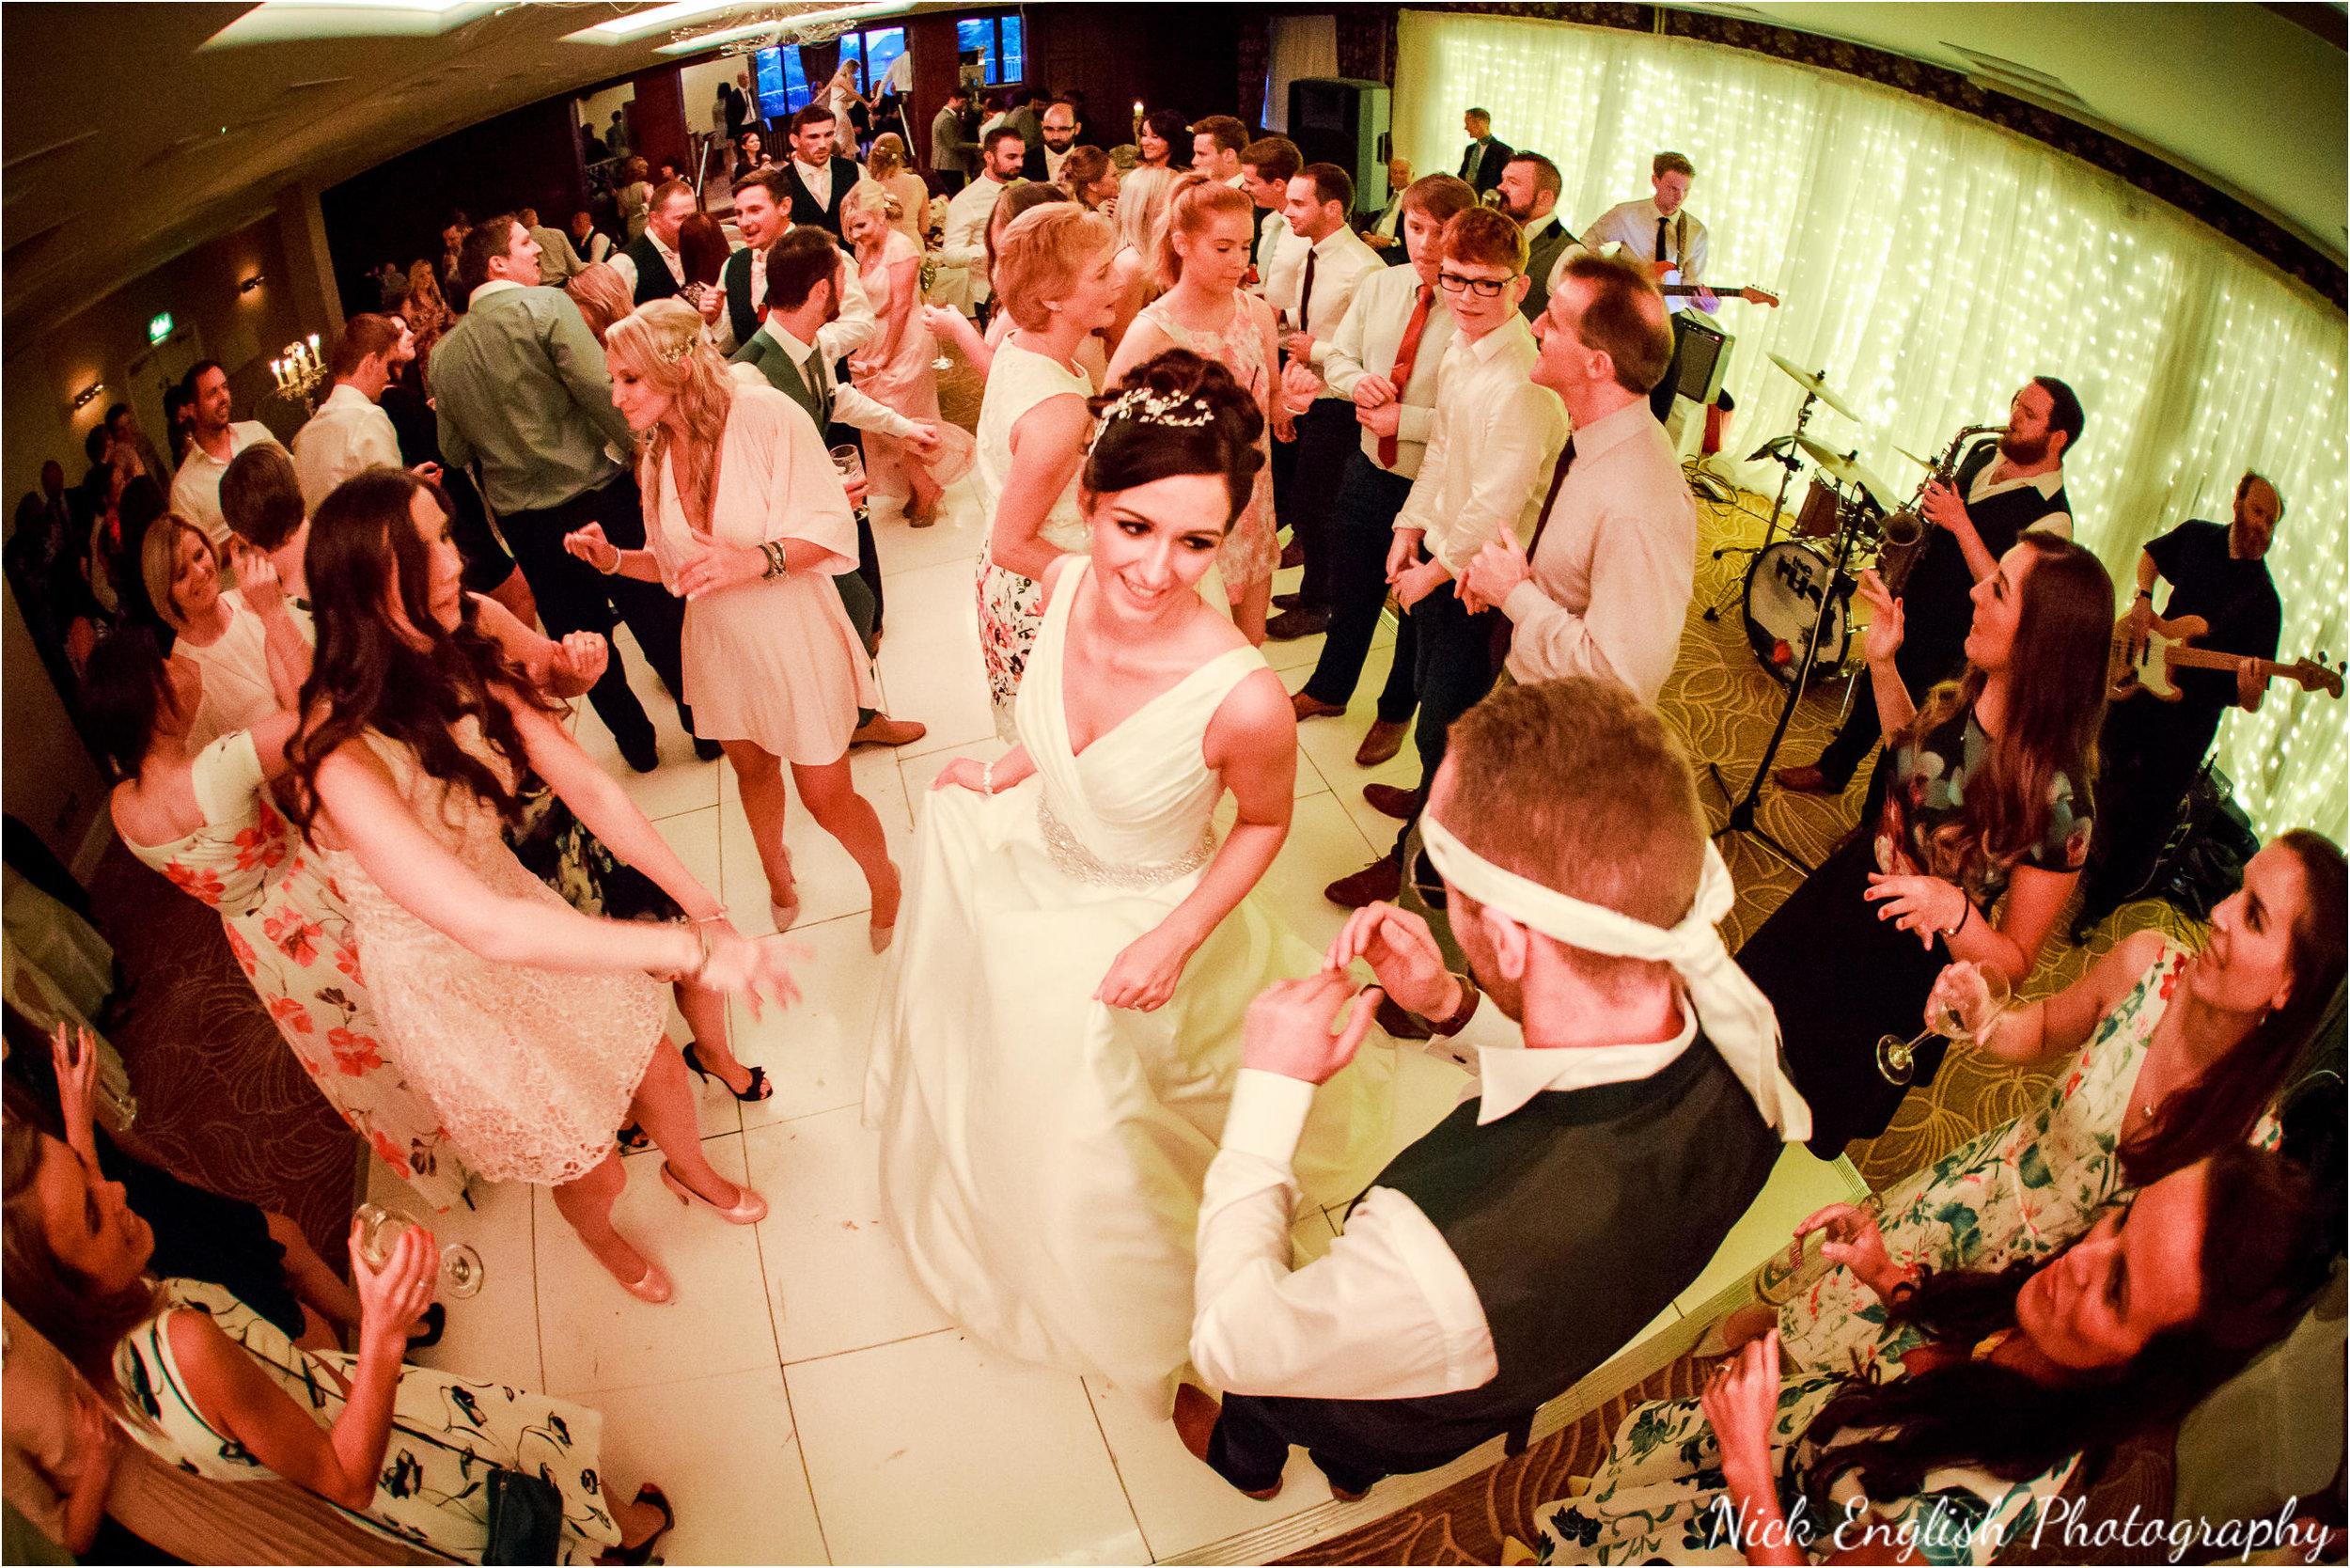 Emily David Wedding Photographs at Barton Grange Preston by Nick English Photography 236jpg.jpeg